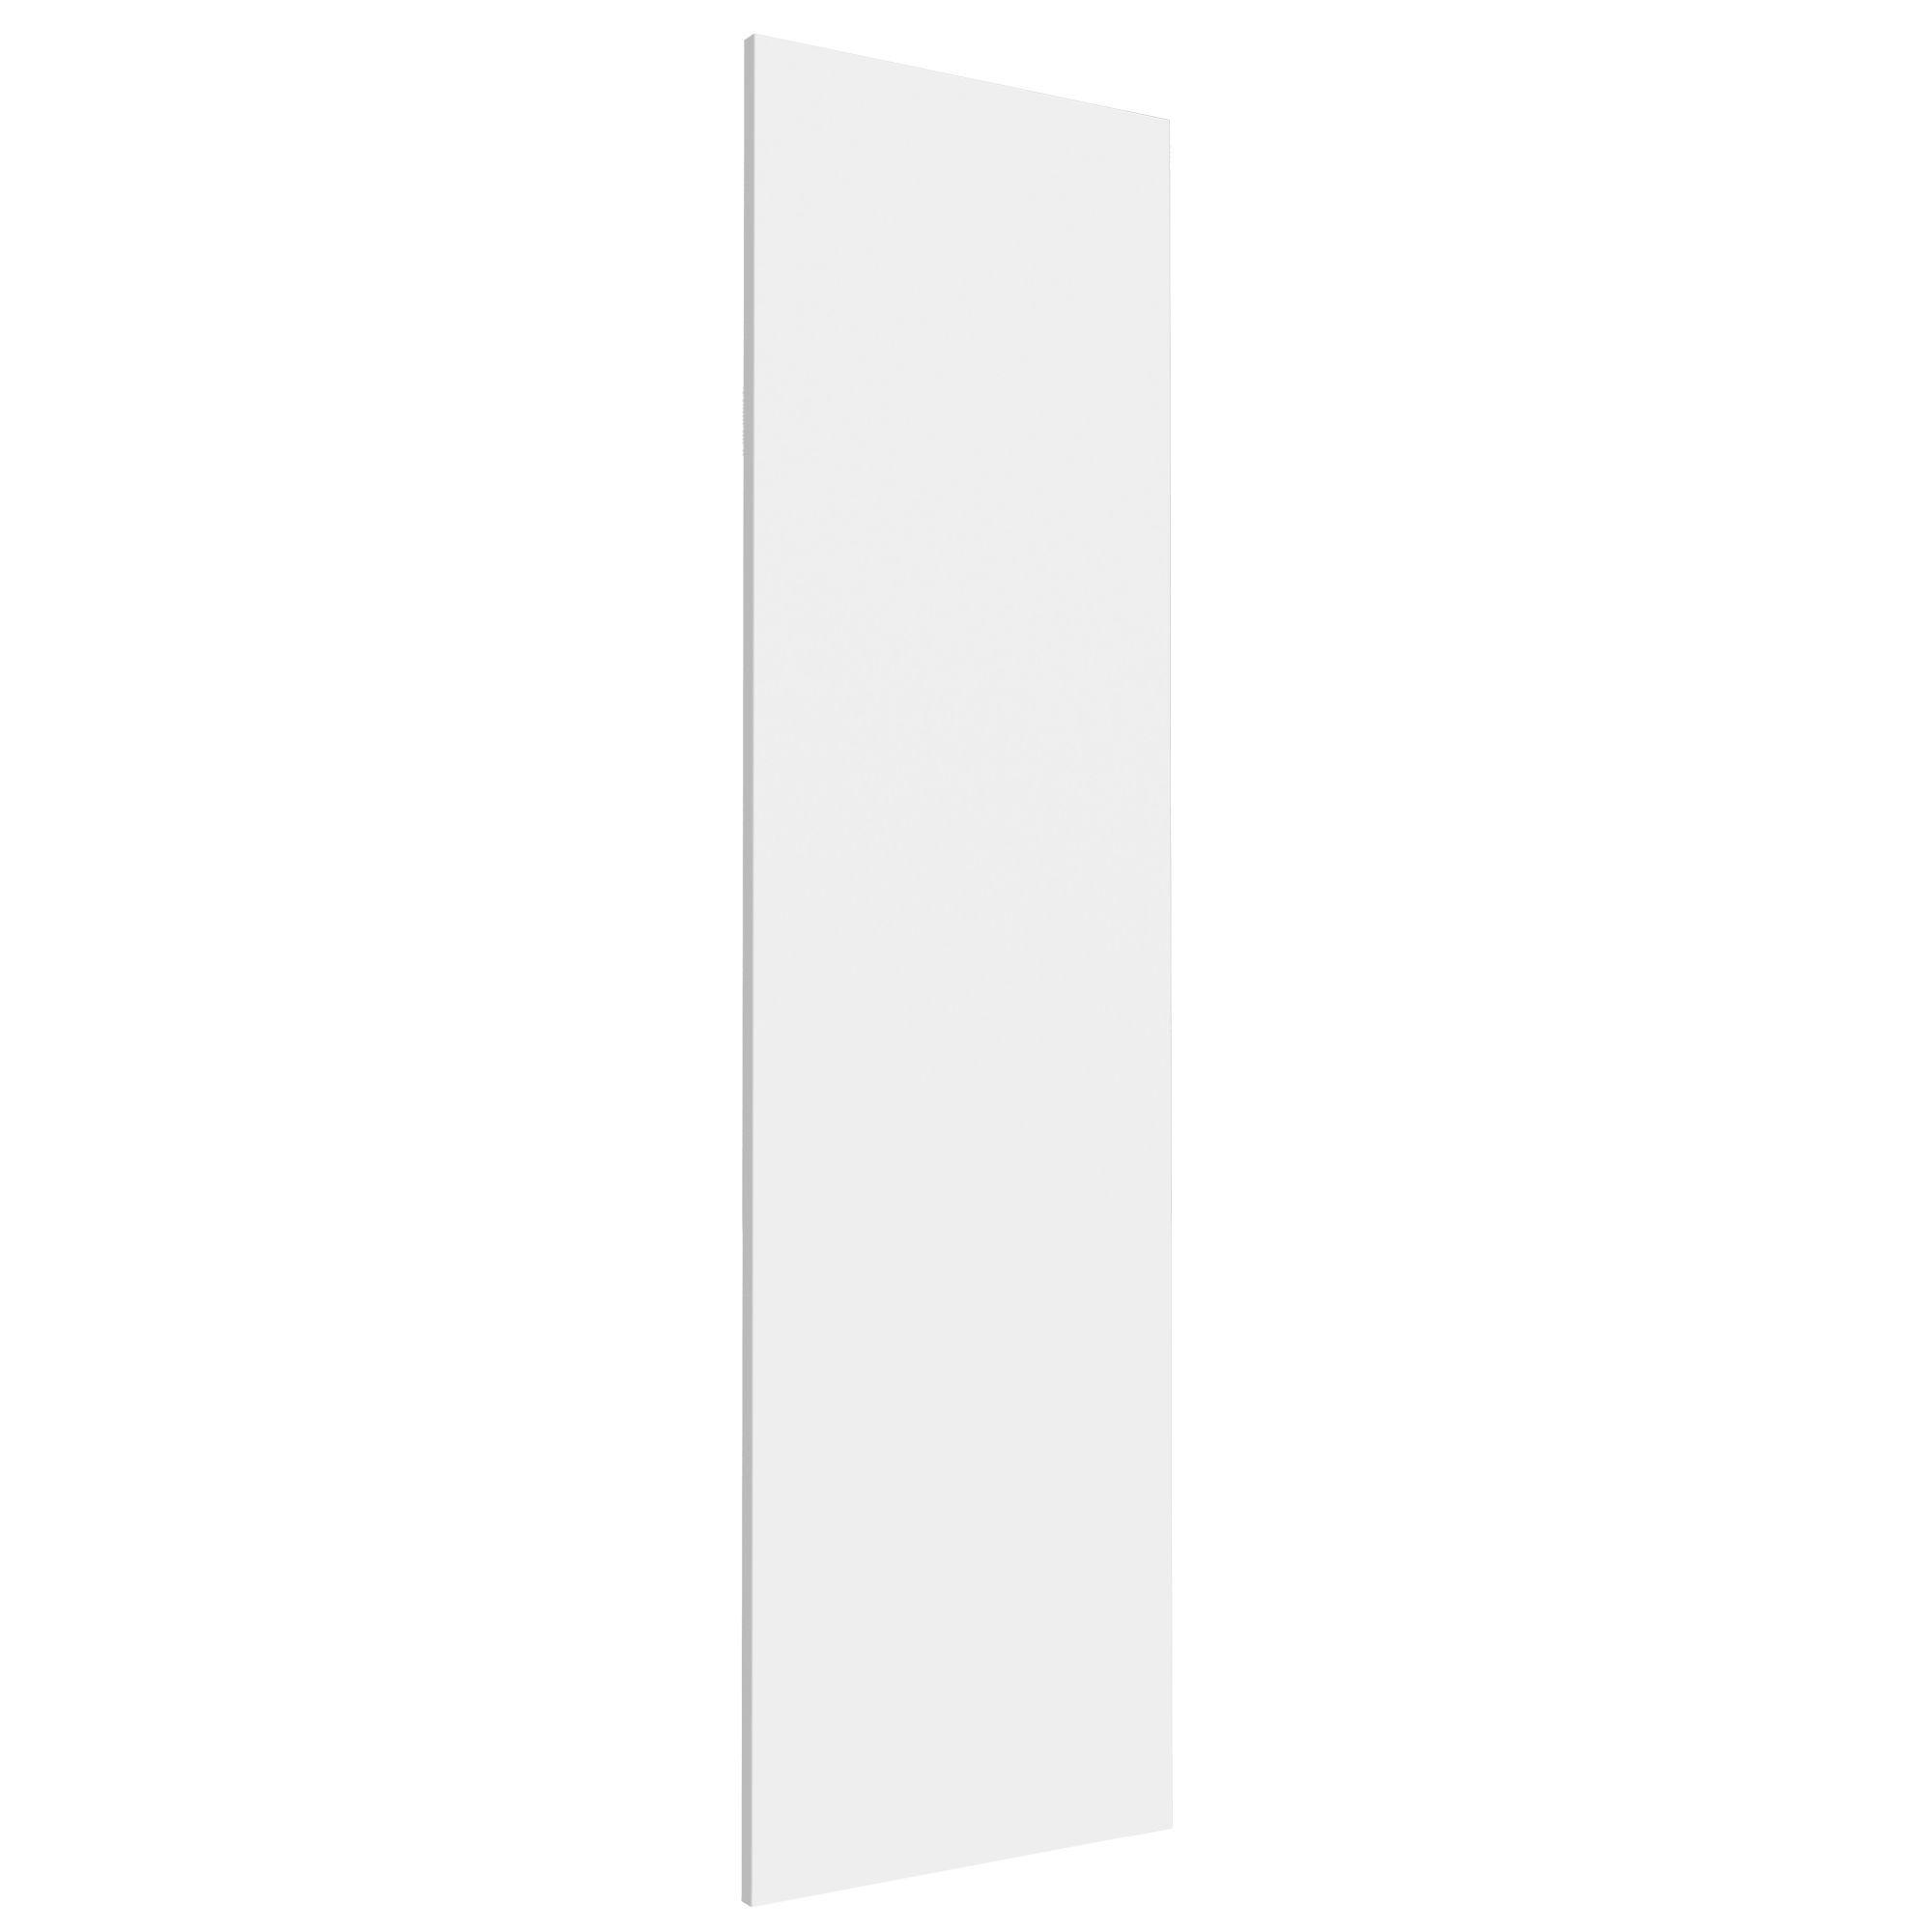 Darwin Modular White Wardrobe Door (h)1440mm (w)372mm